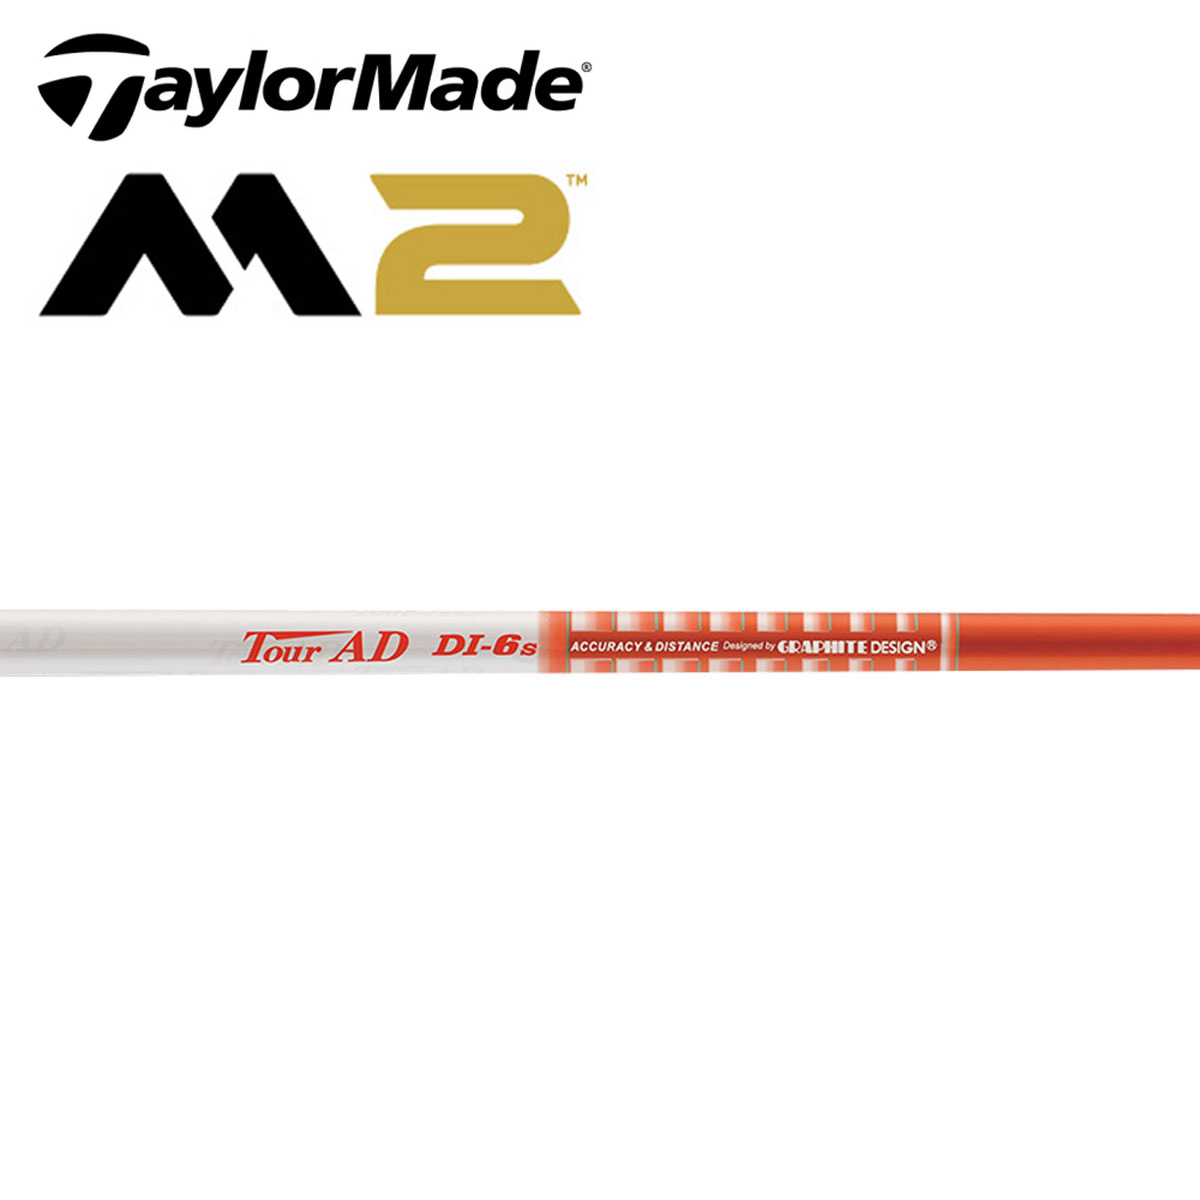 Tour AD DIシリーズ M2 ドライバーロフト12度用スリーブ付きシャフト 2016年モデル【テーラーメイド専用】